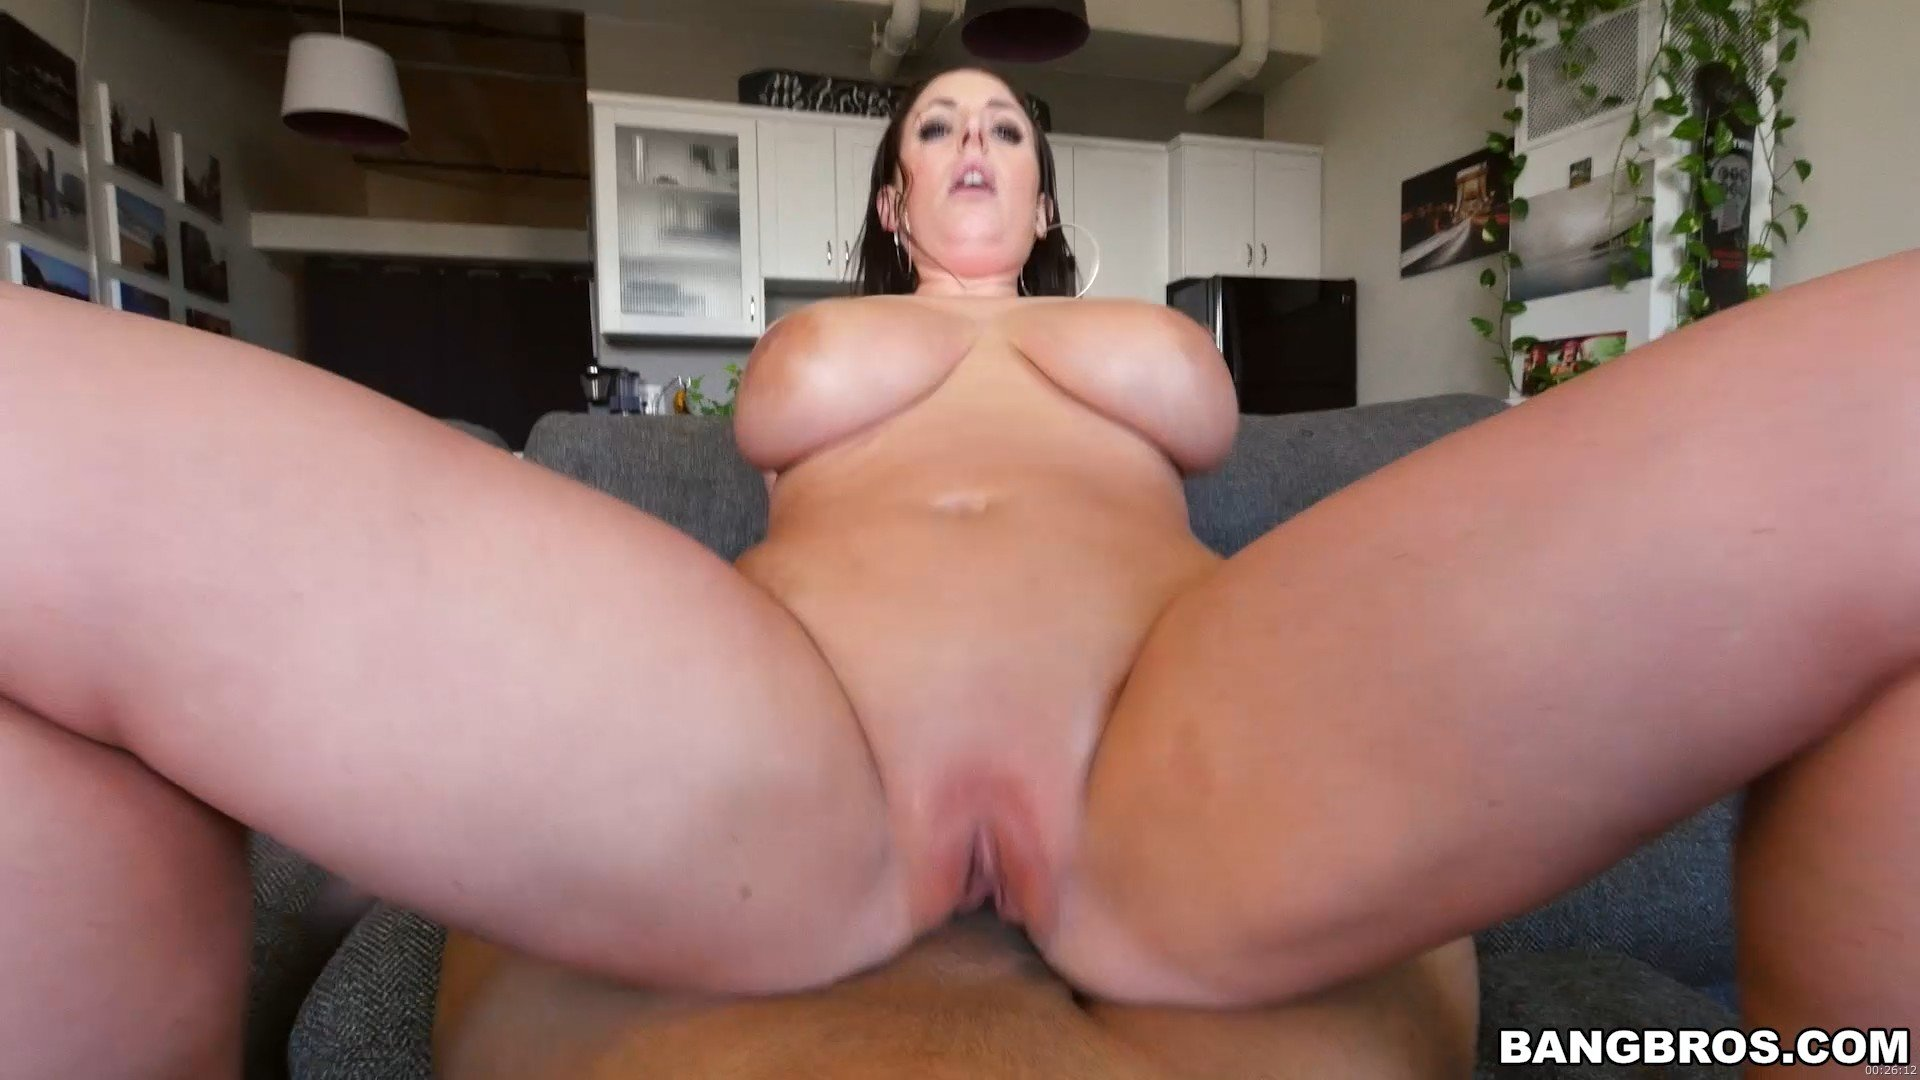 247706 bangbros 2017-02-23 Angela White's 32 double g tits are breathtaking